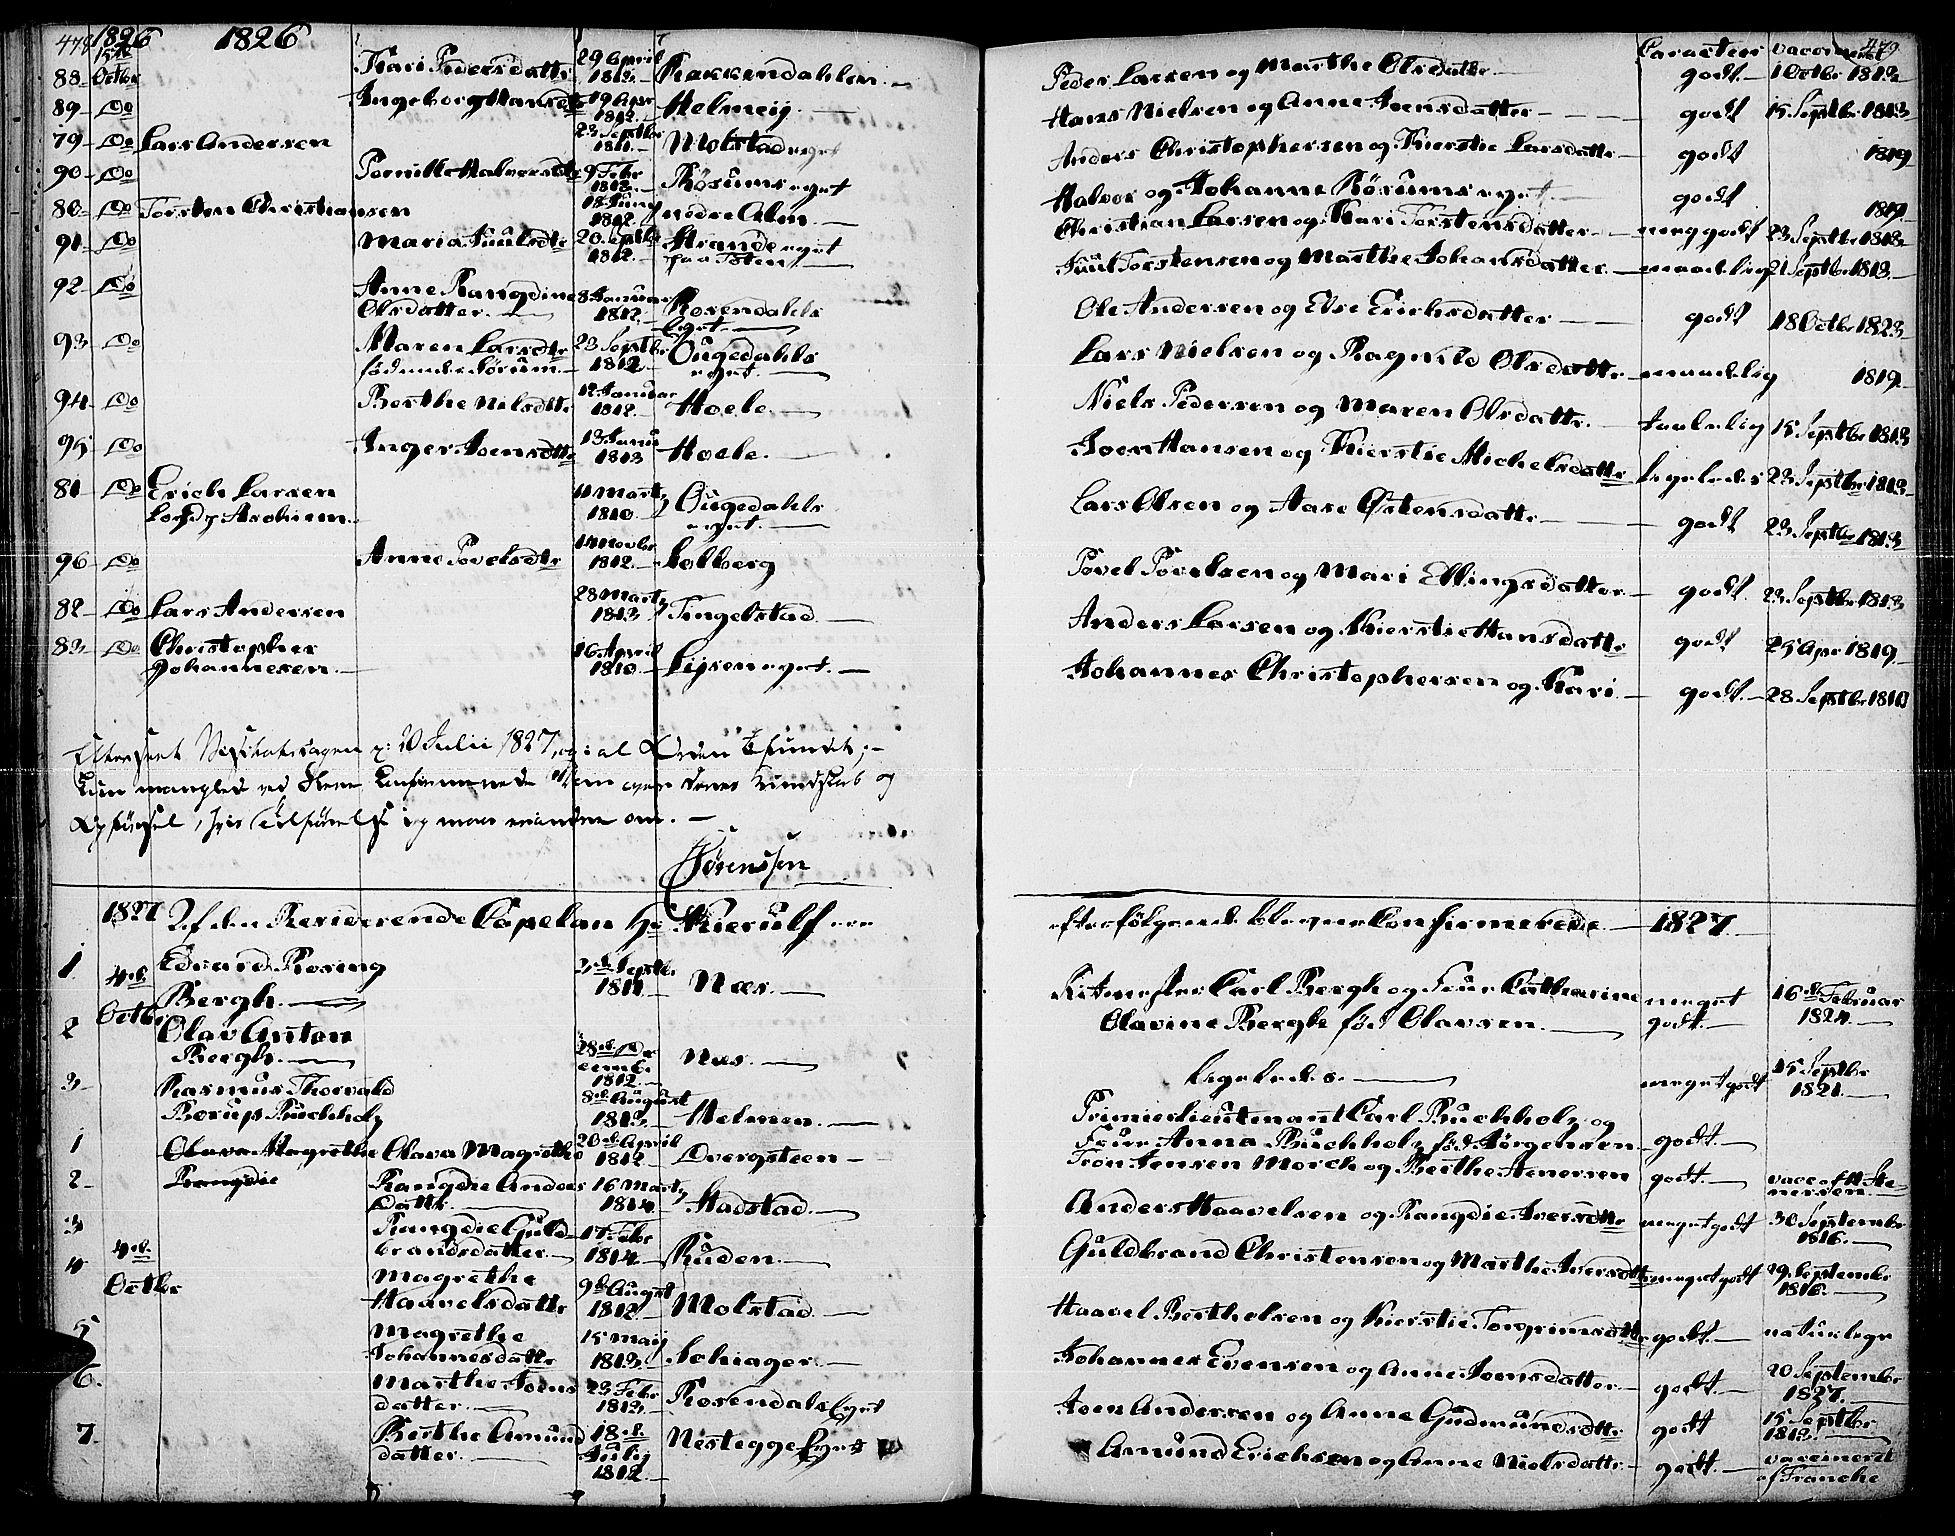 SAH, Gran prestekontor, Ministerialbok nr. 10, 1824-1842, s. 478-479